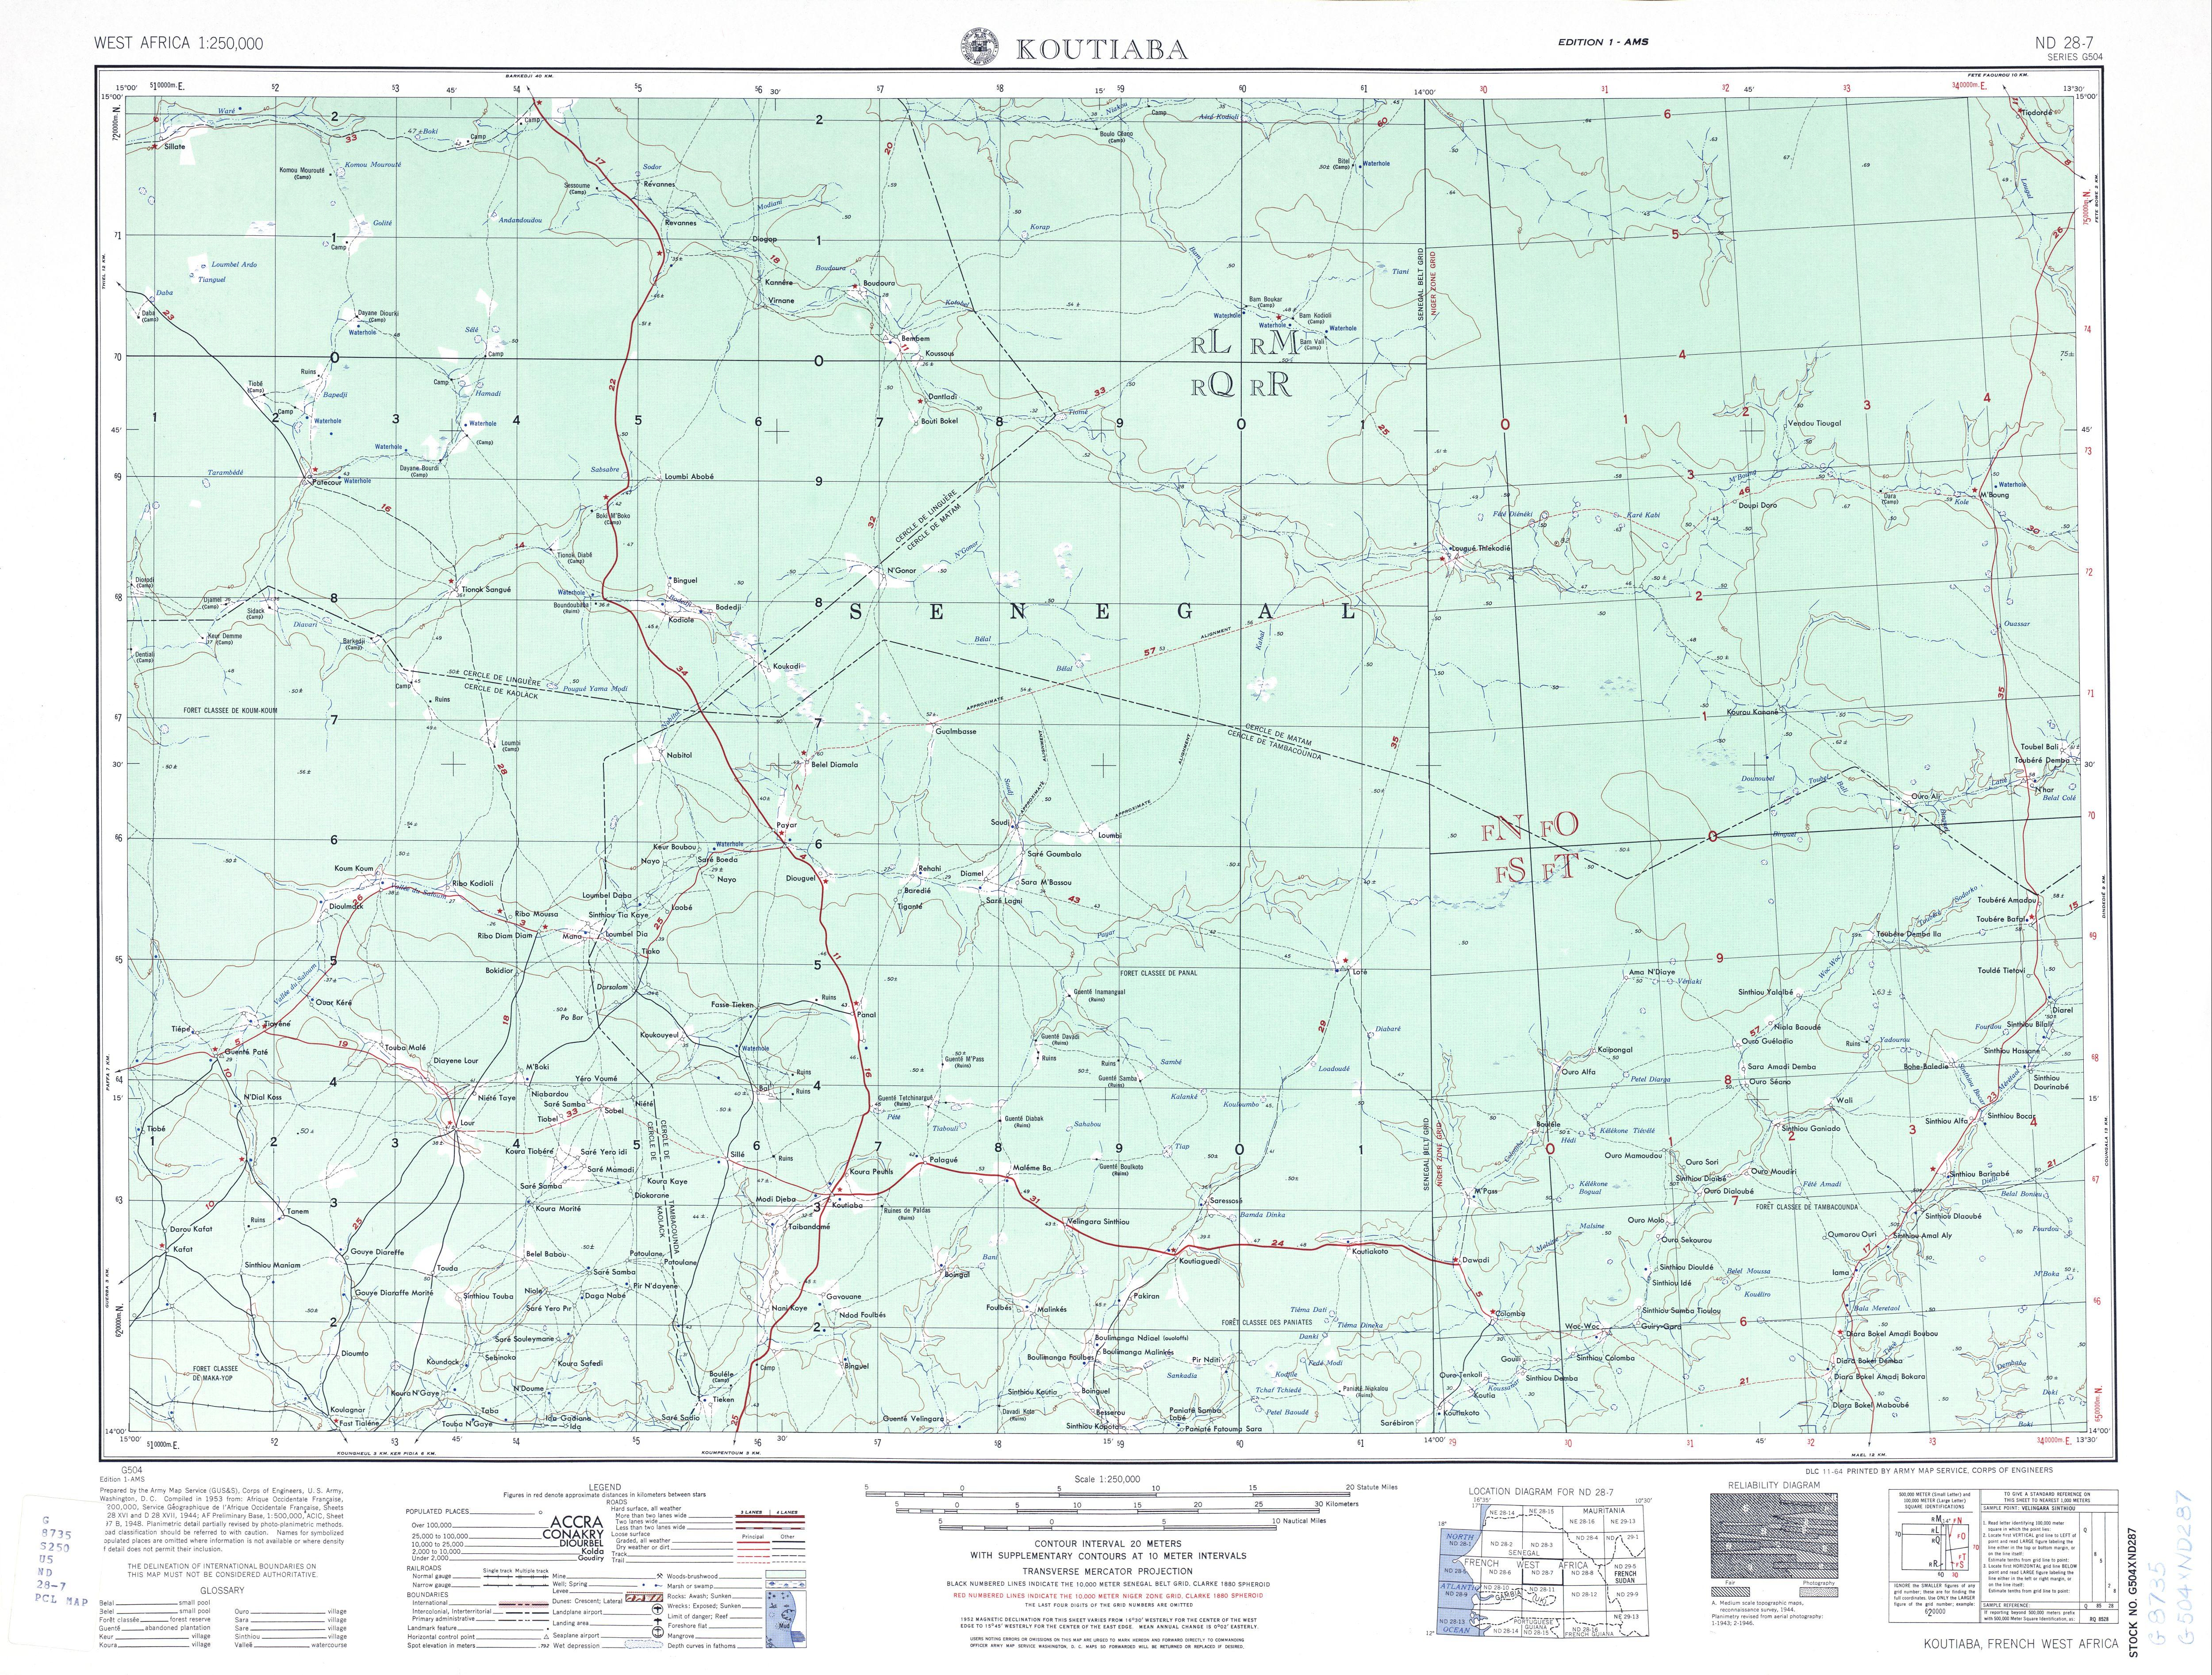 Koutiaba Topographic Map Sheet, Western Africa 1955